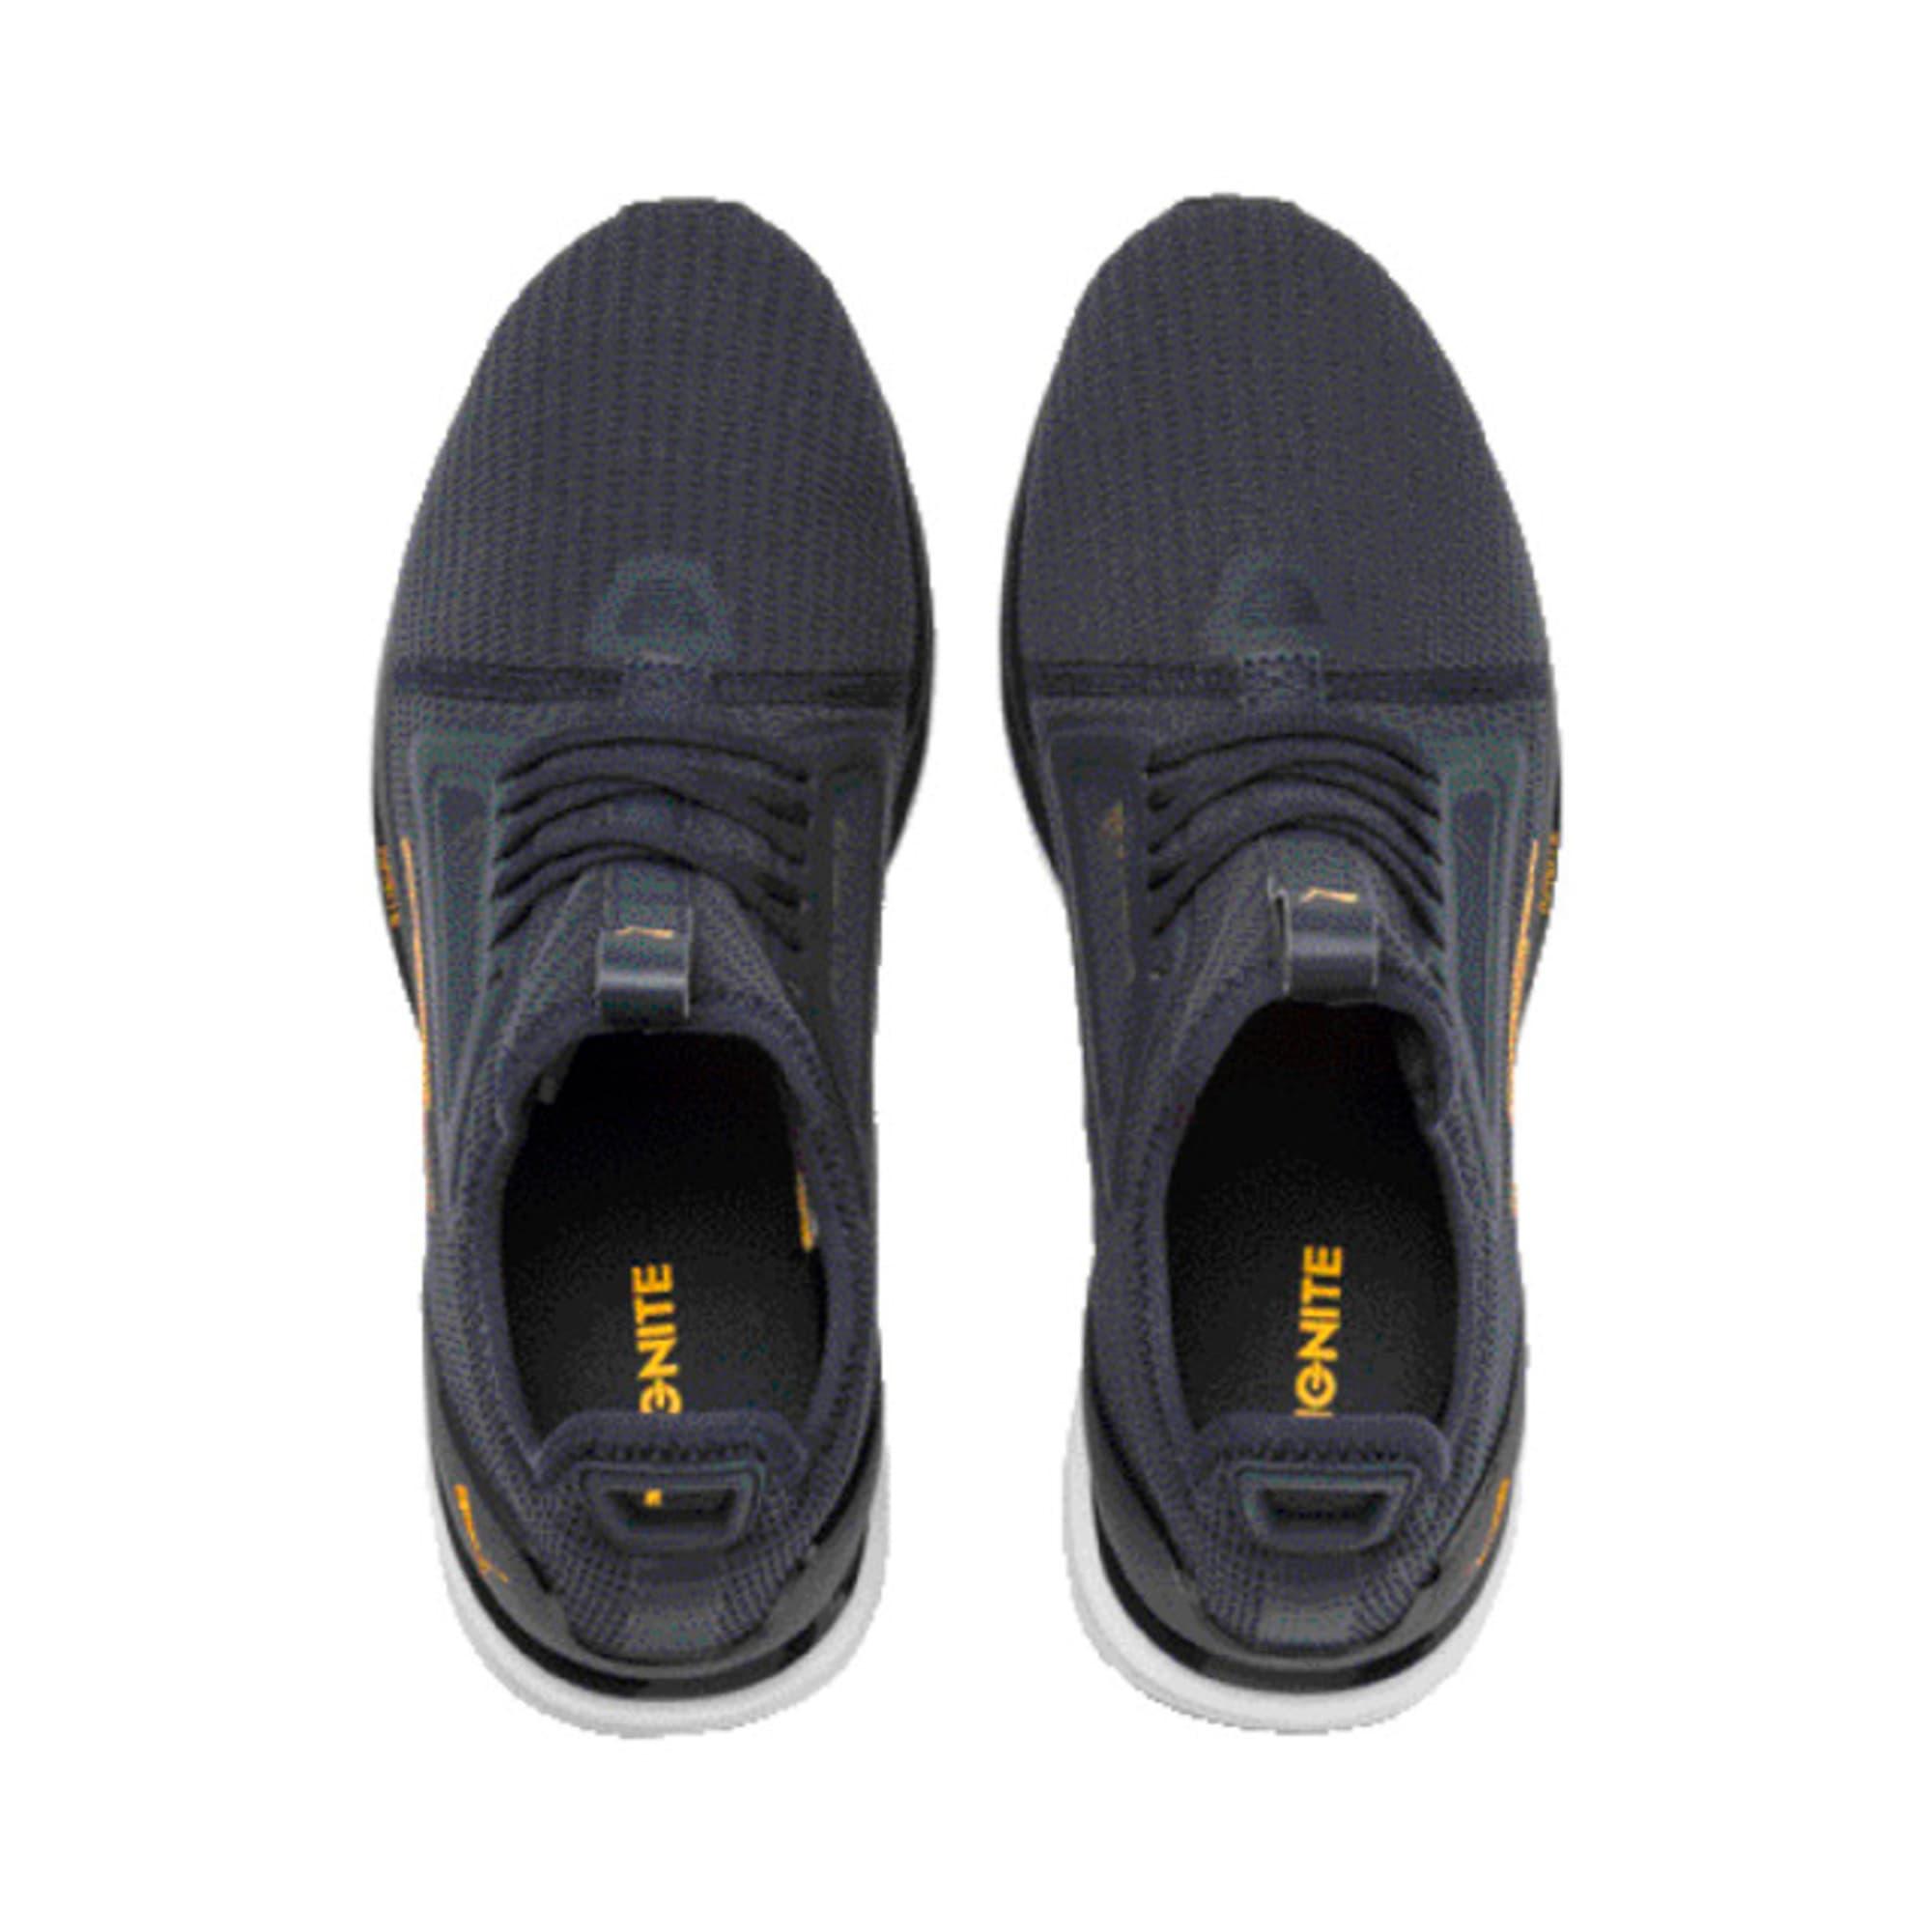 Thumbnail 4 of IGNITE Limitless Lean Running Shoes, Peacoat-Orange Alert, medium-IND